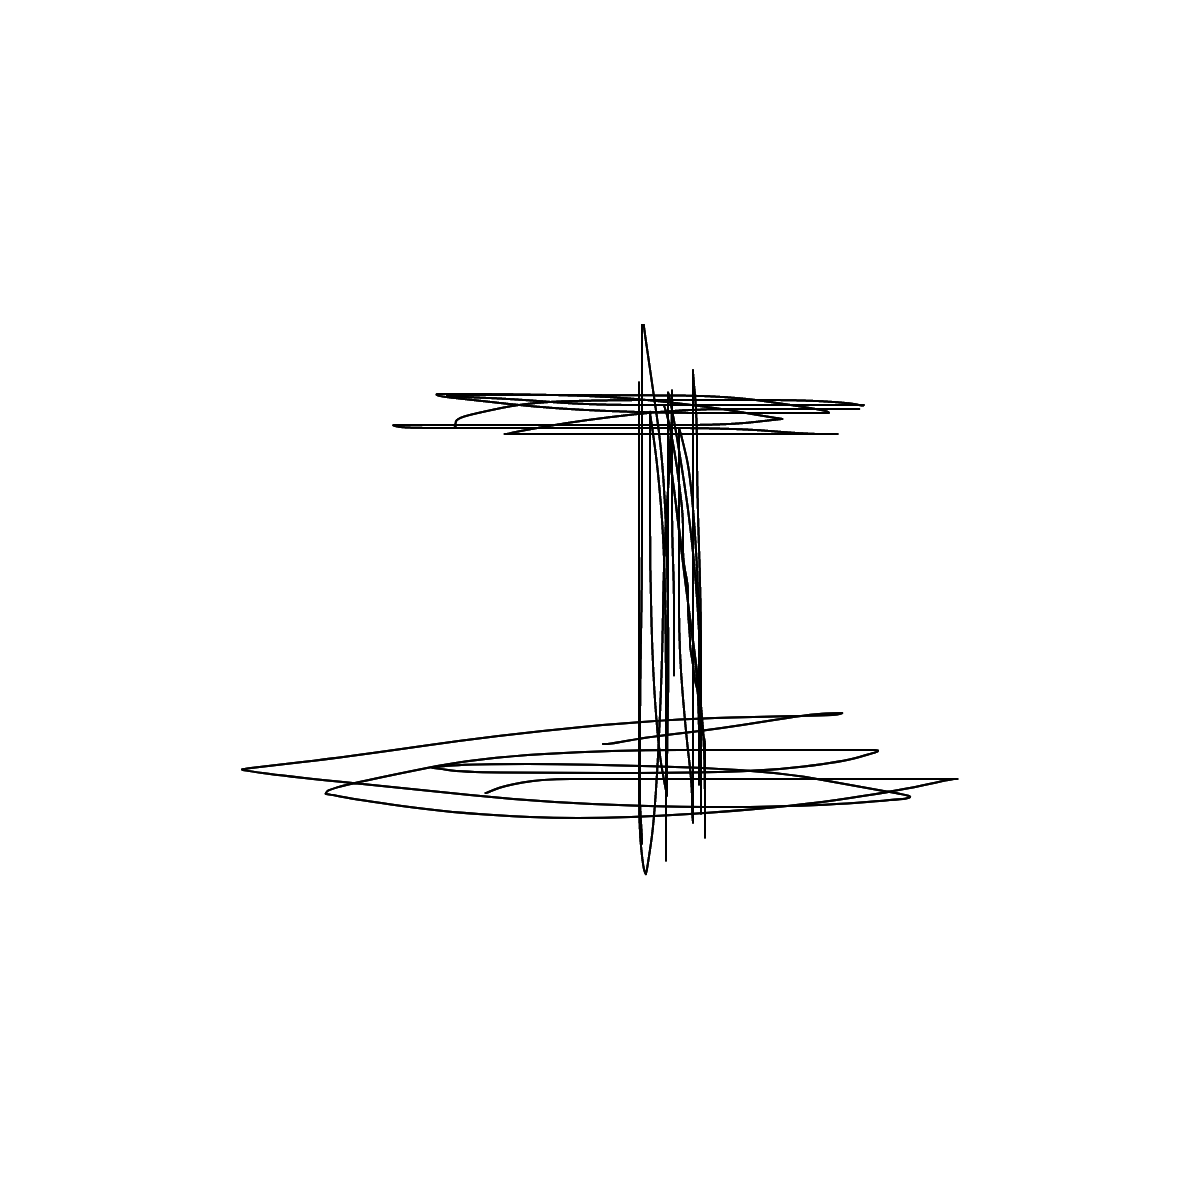 BAAAM drawing#23427 lat:77.0888748168945300lng: 156.5493621826172000